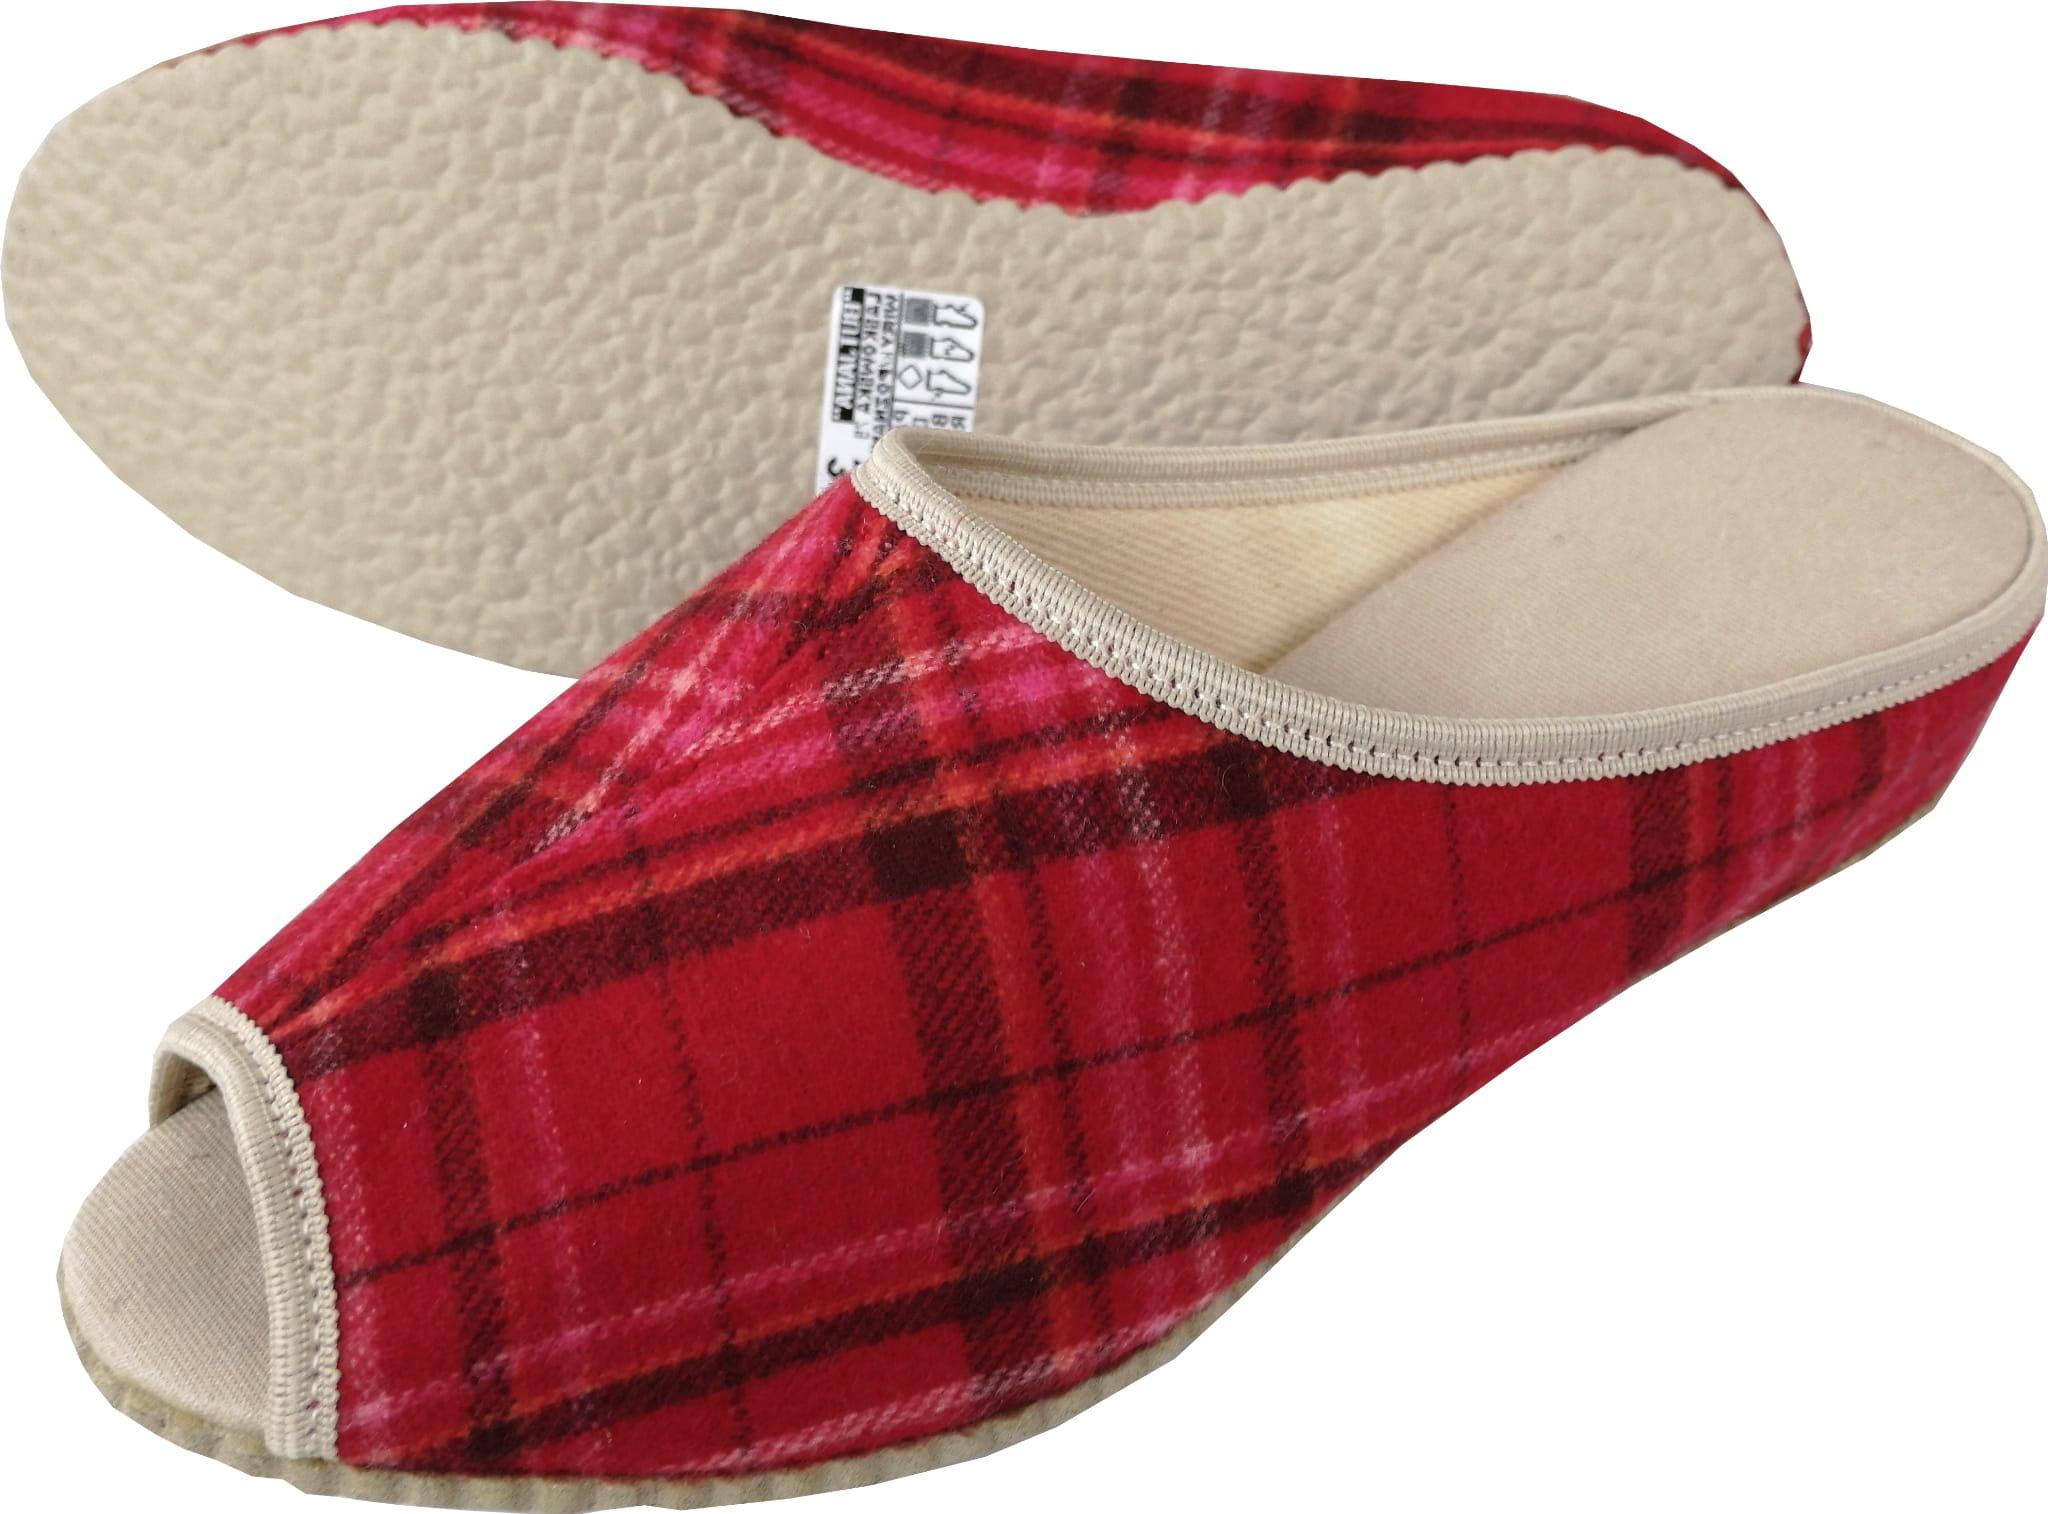 pantofle damskie women''s slippers